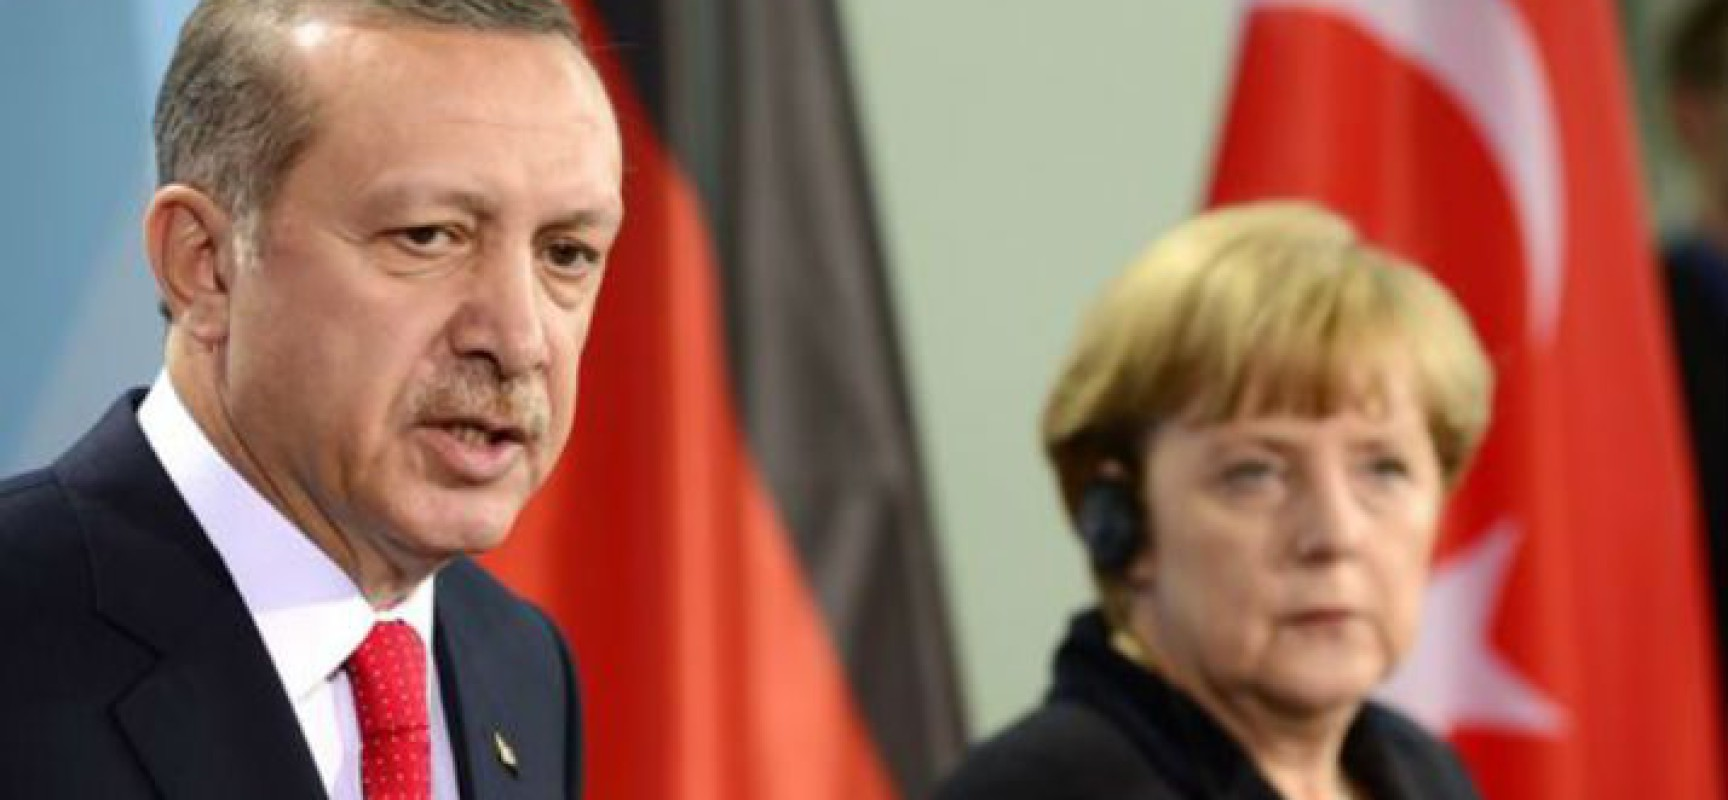 La chancelière allemande Angela Merkel menace la Turquie